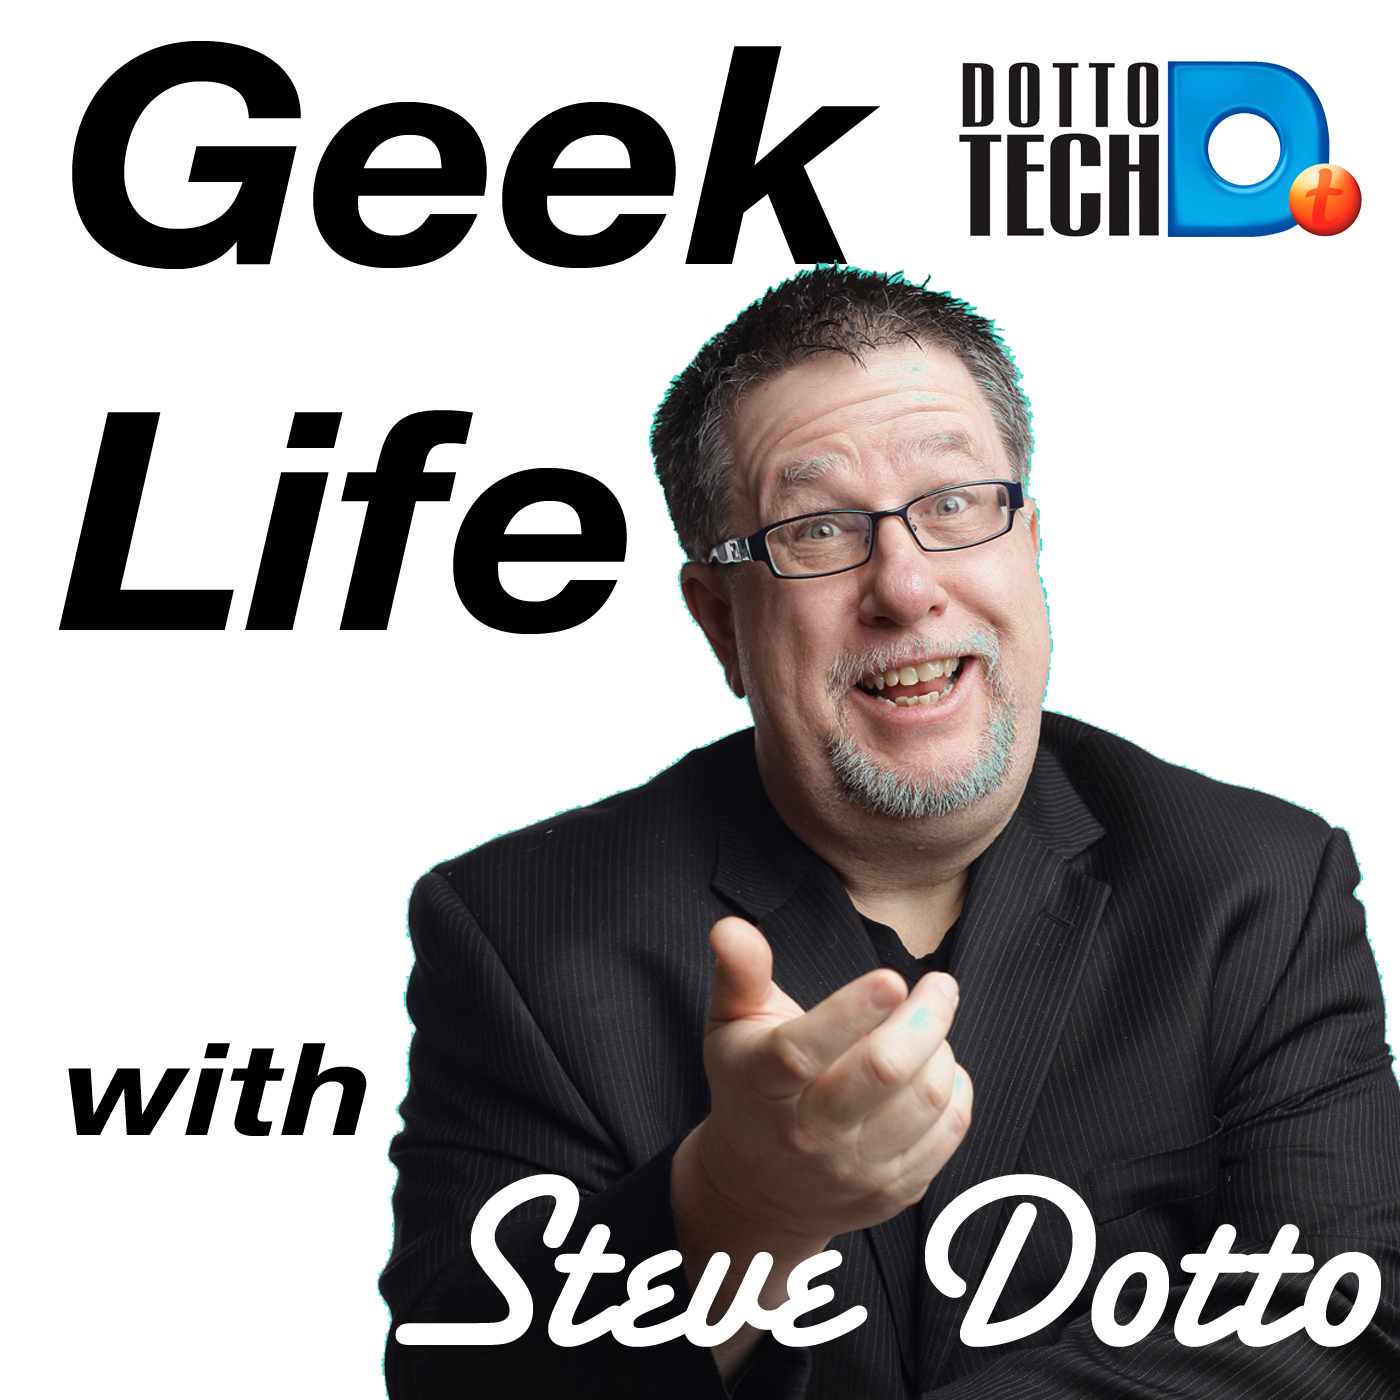 Dotto Tech Radio